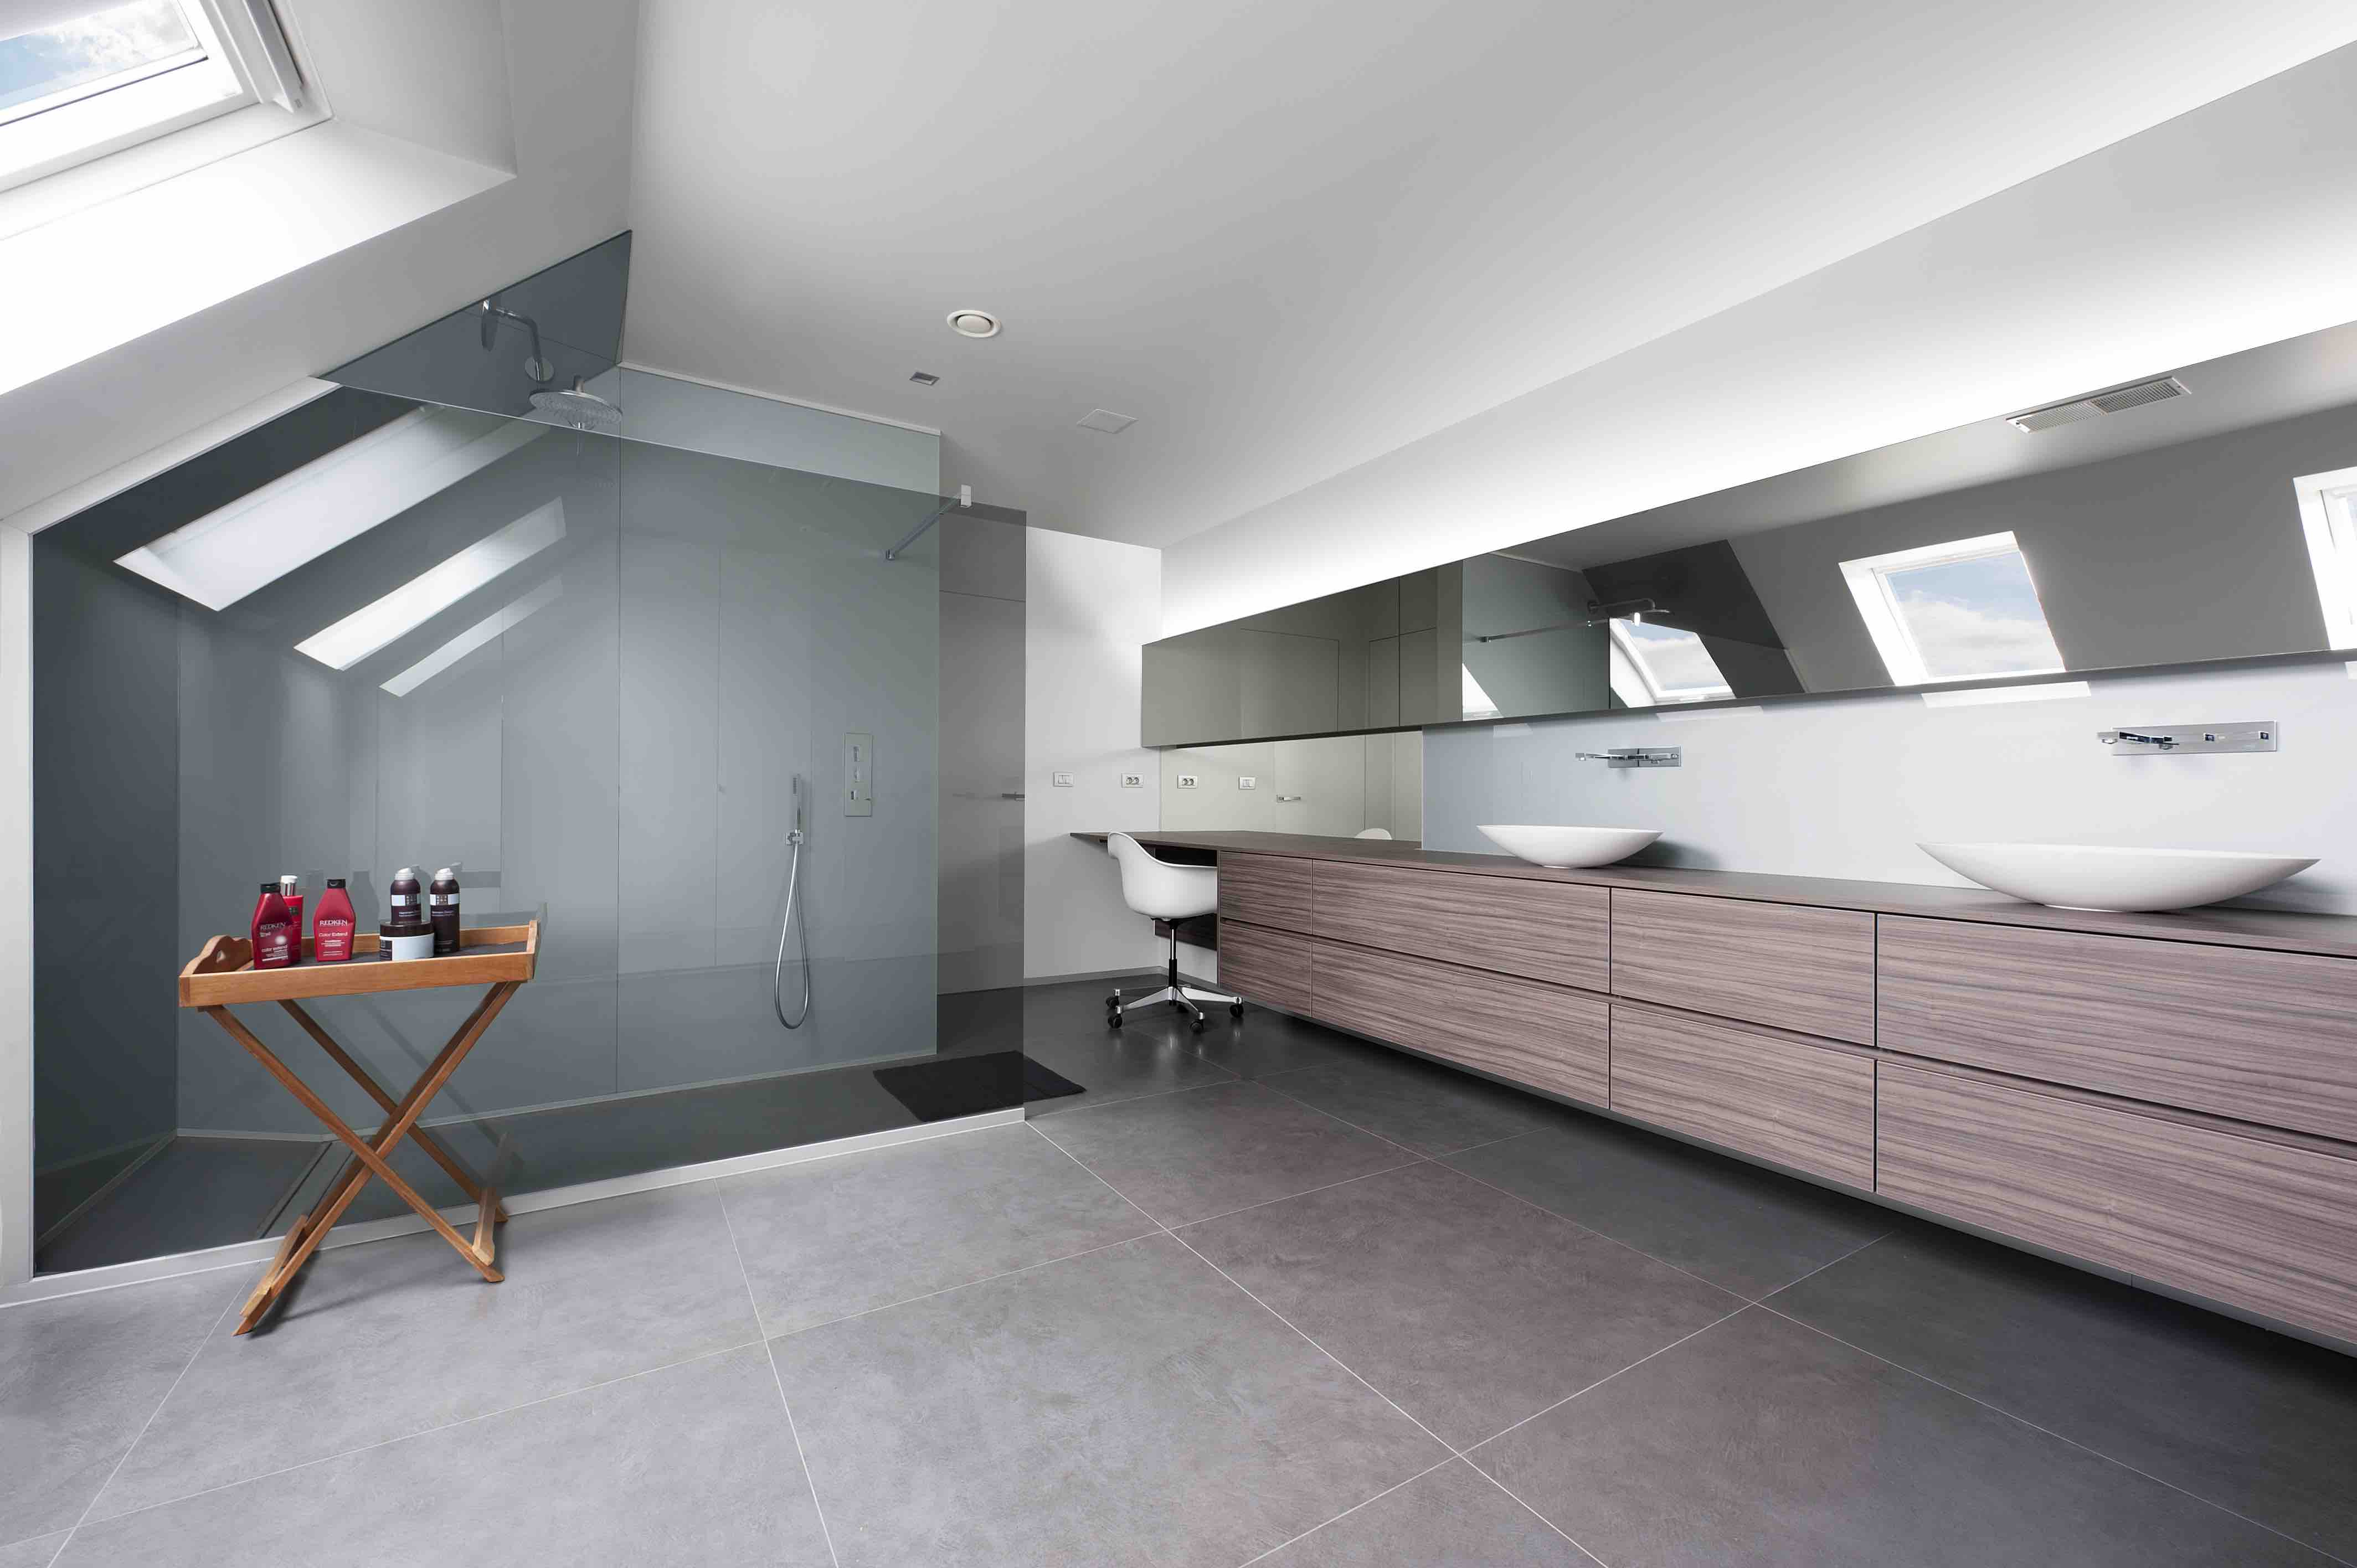 Douchewand en spiegels onder dak04